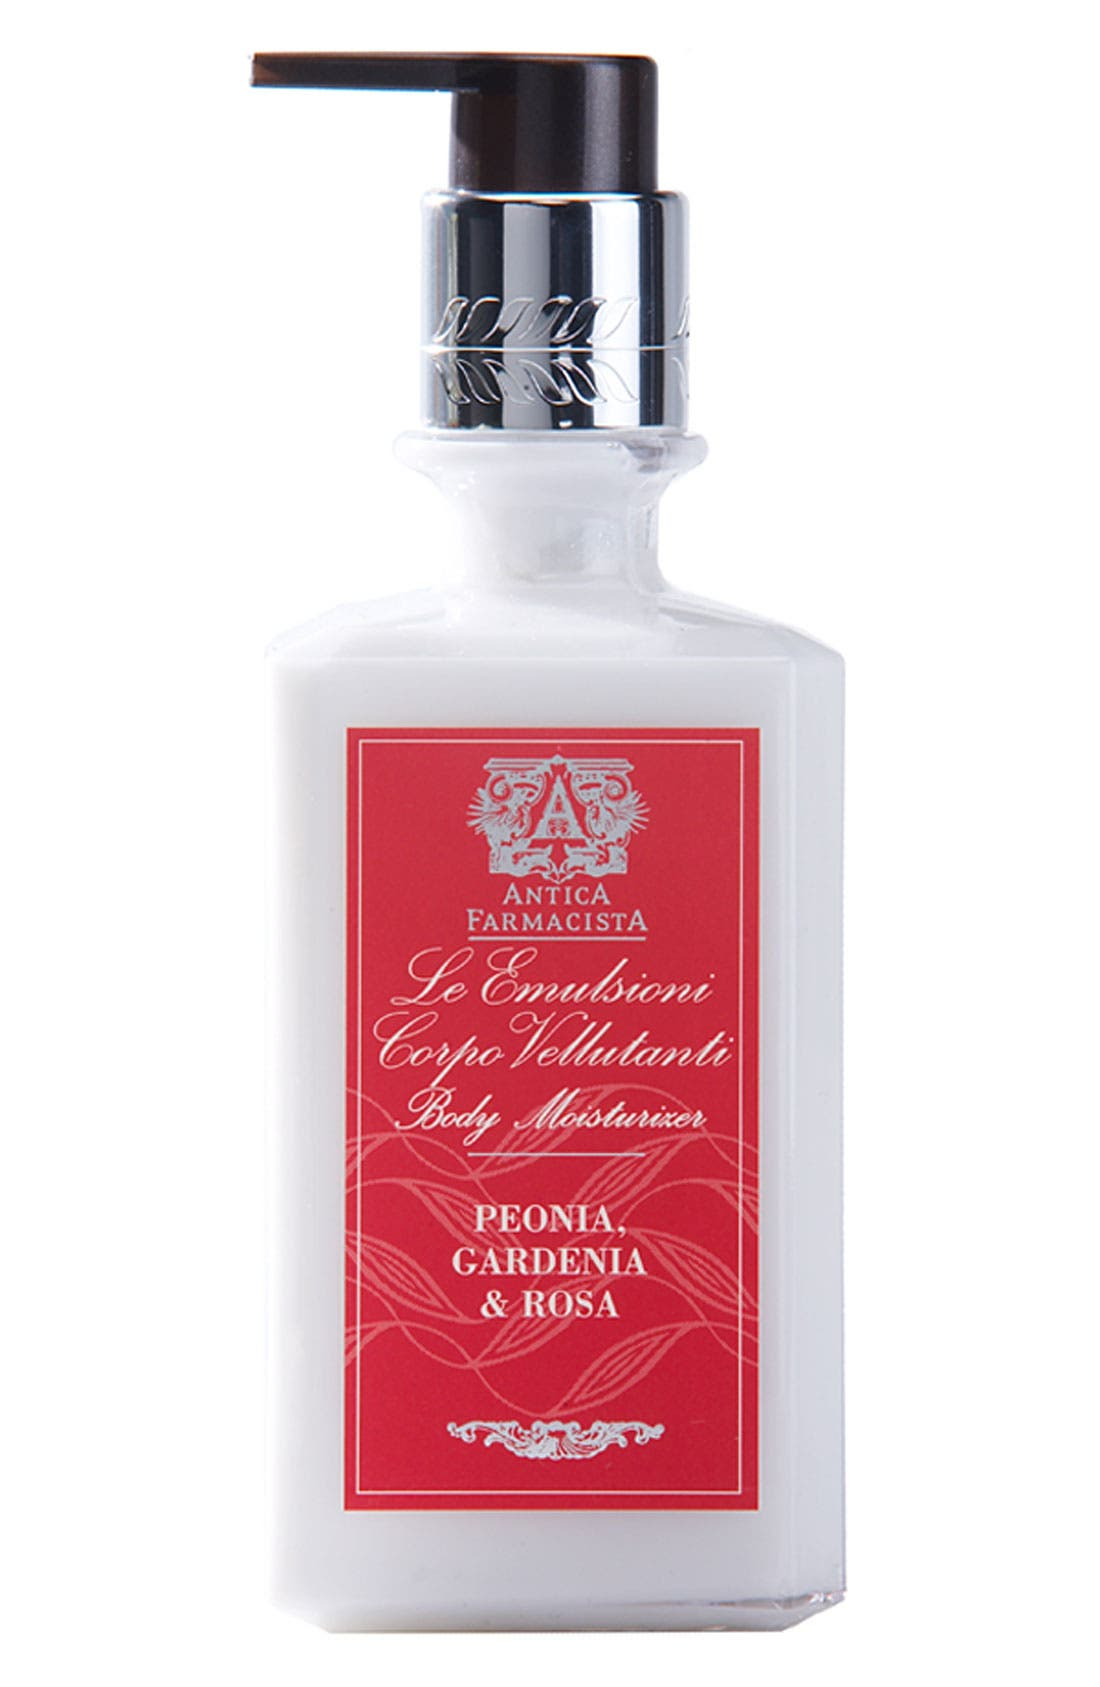 Antica Farmacista 'Peonia, Gardenia & Rosa' Body Moisturizer